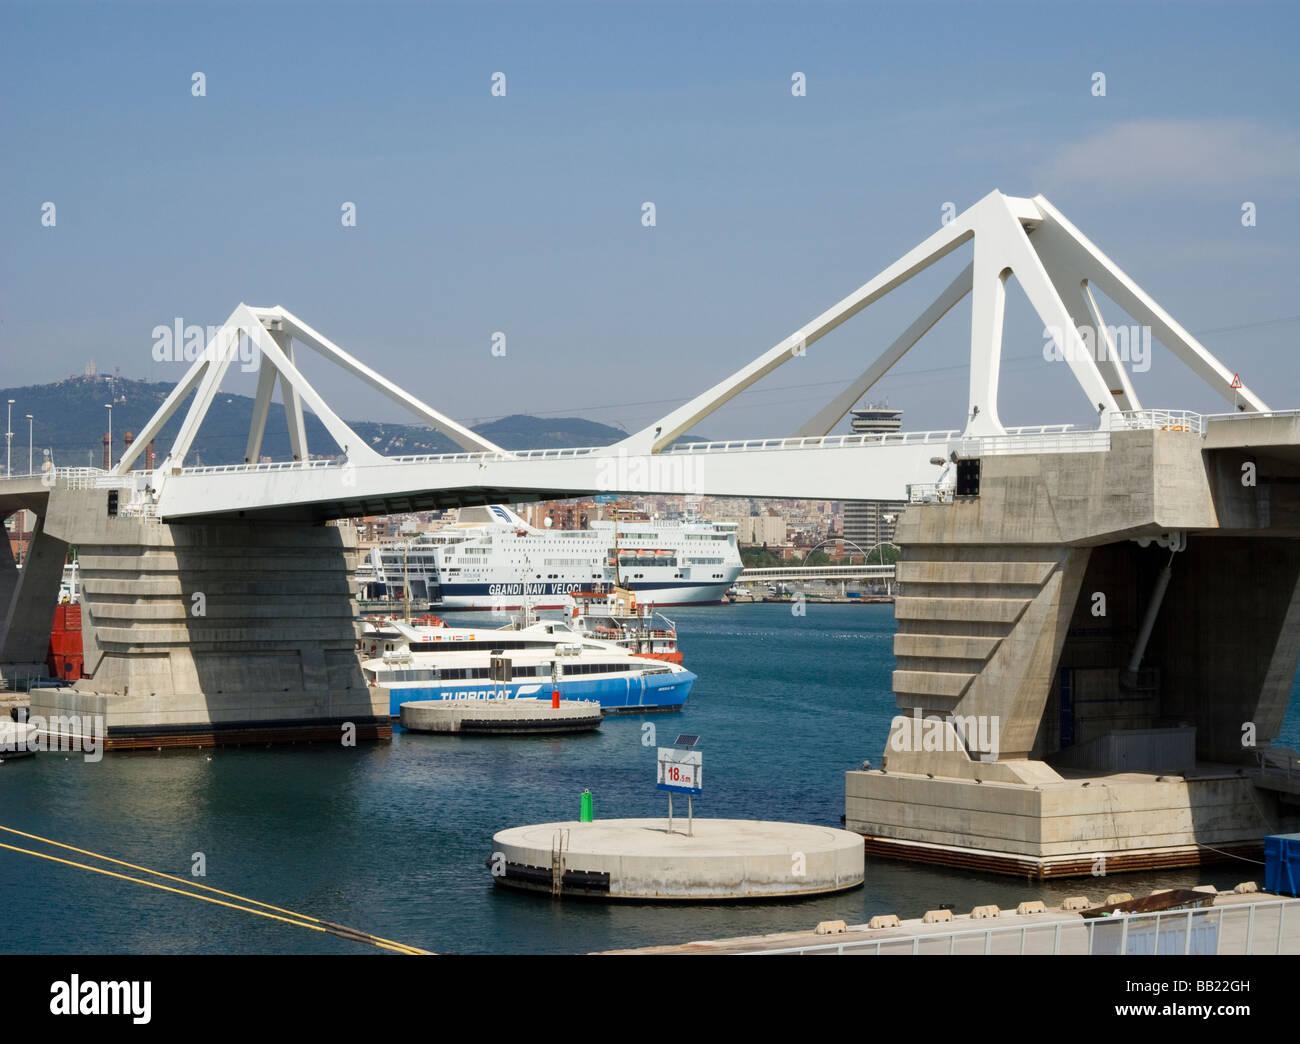 Spain.Port of Barcelona.New bridge. - Stock Image